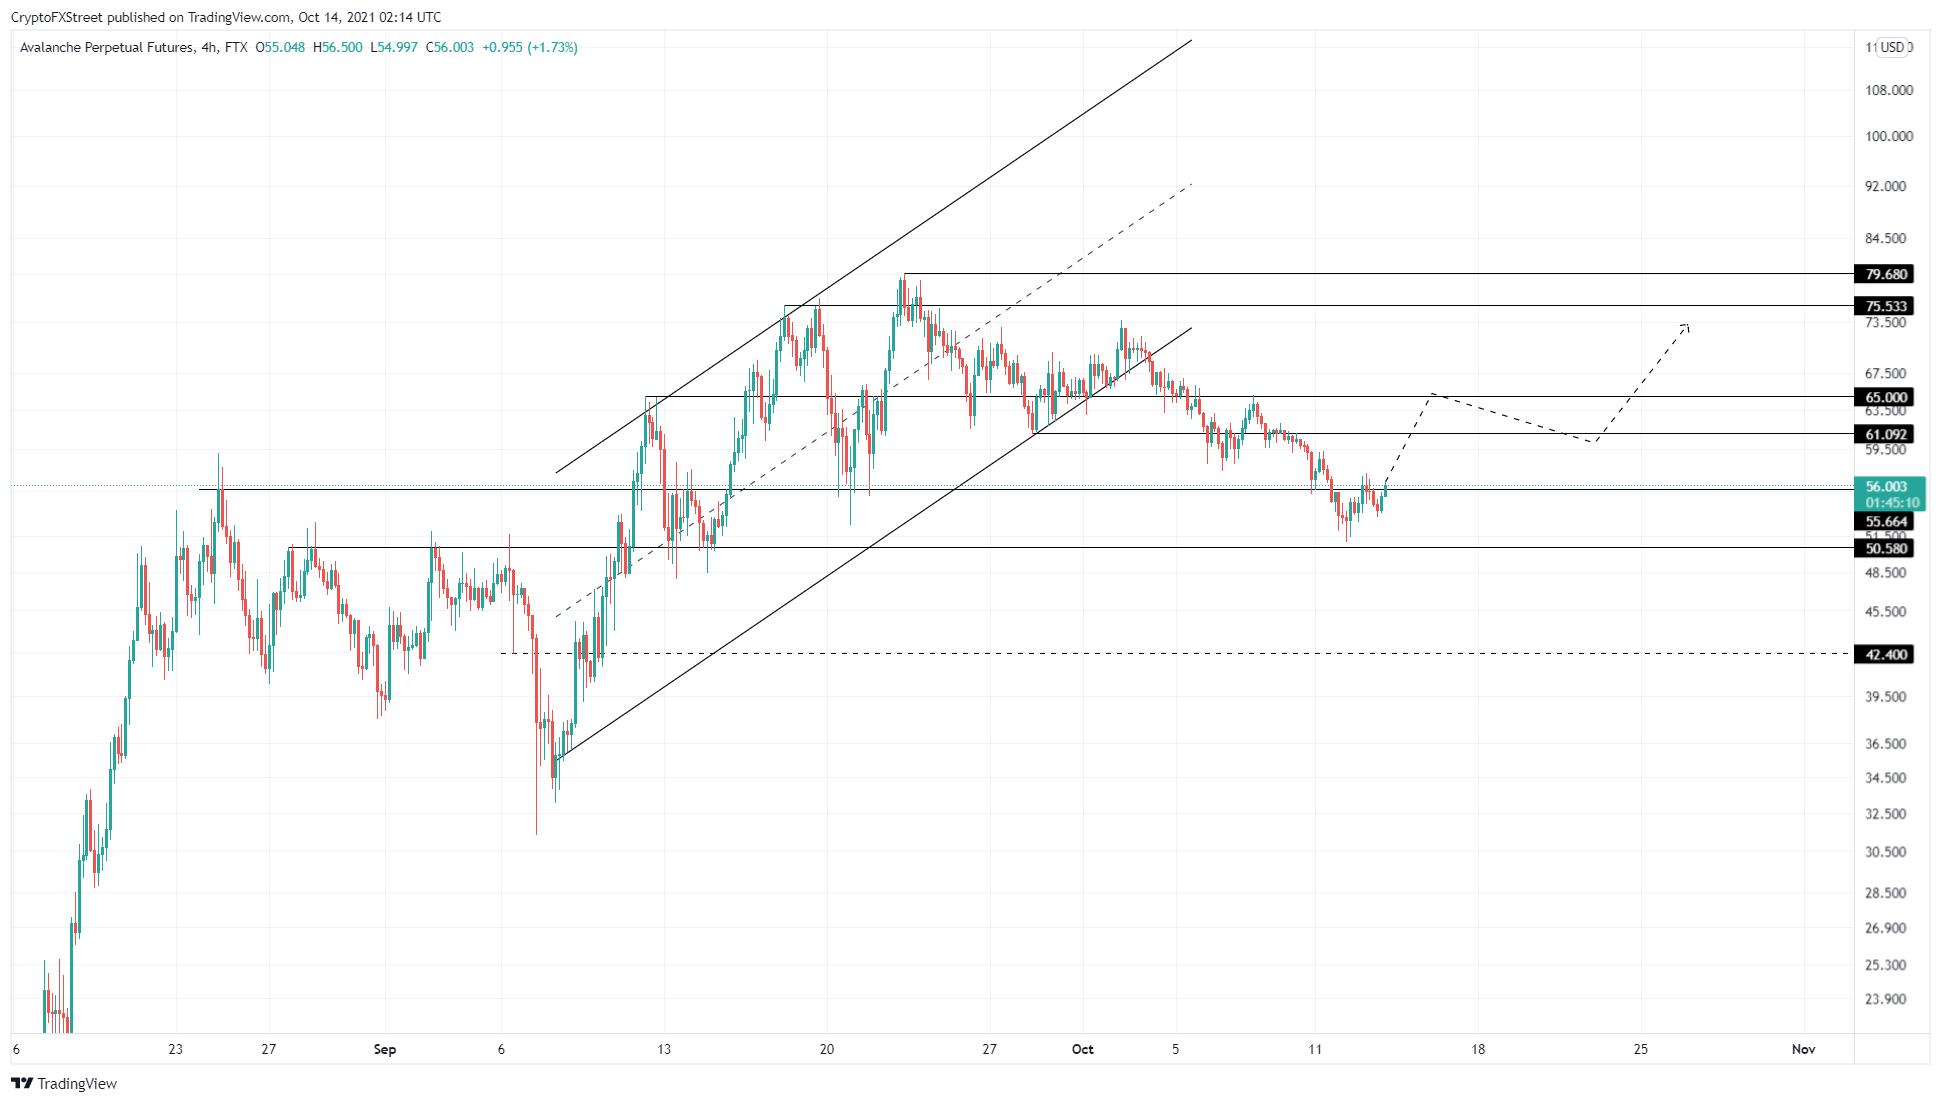 AVAX/USDT 4-hour chart